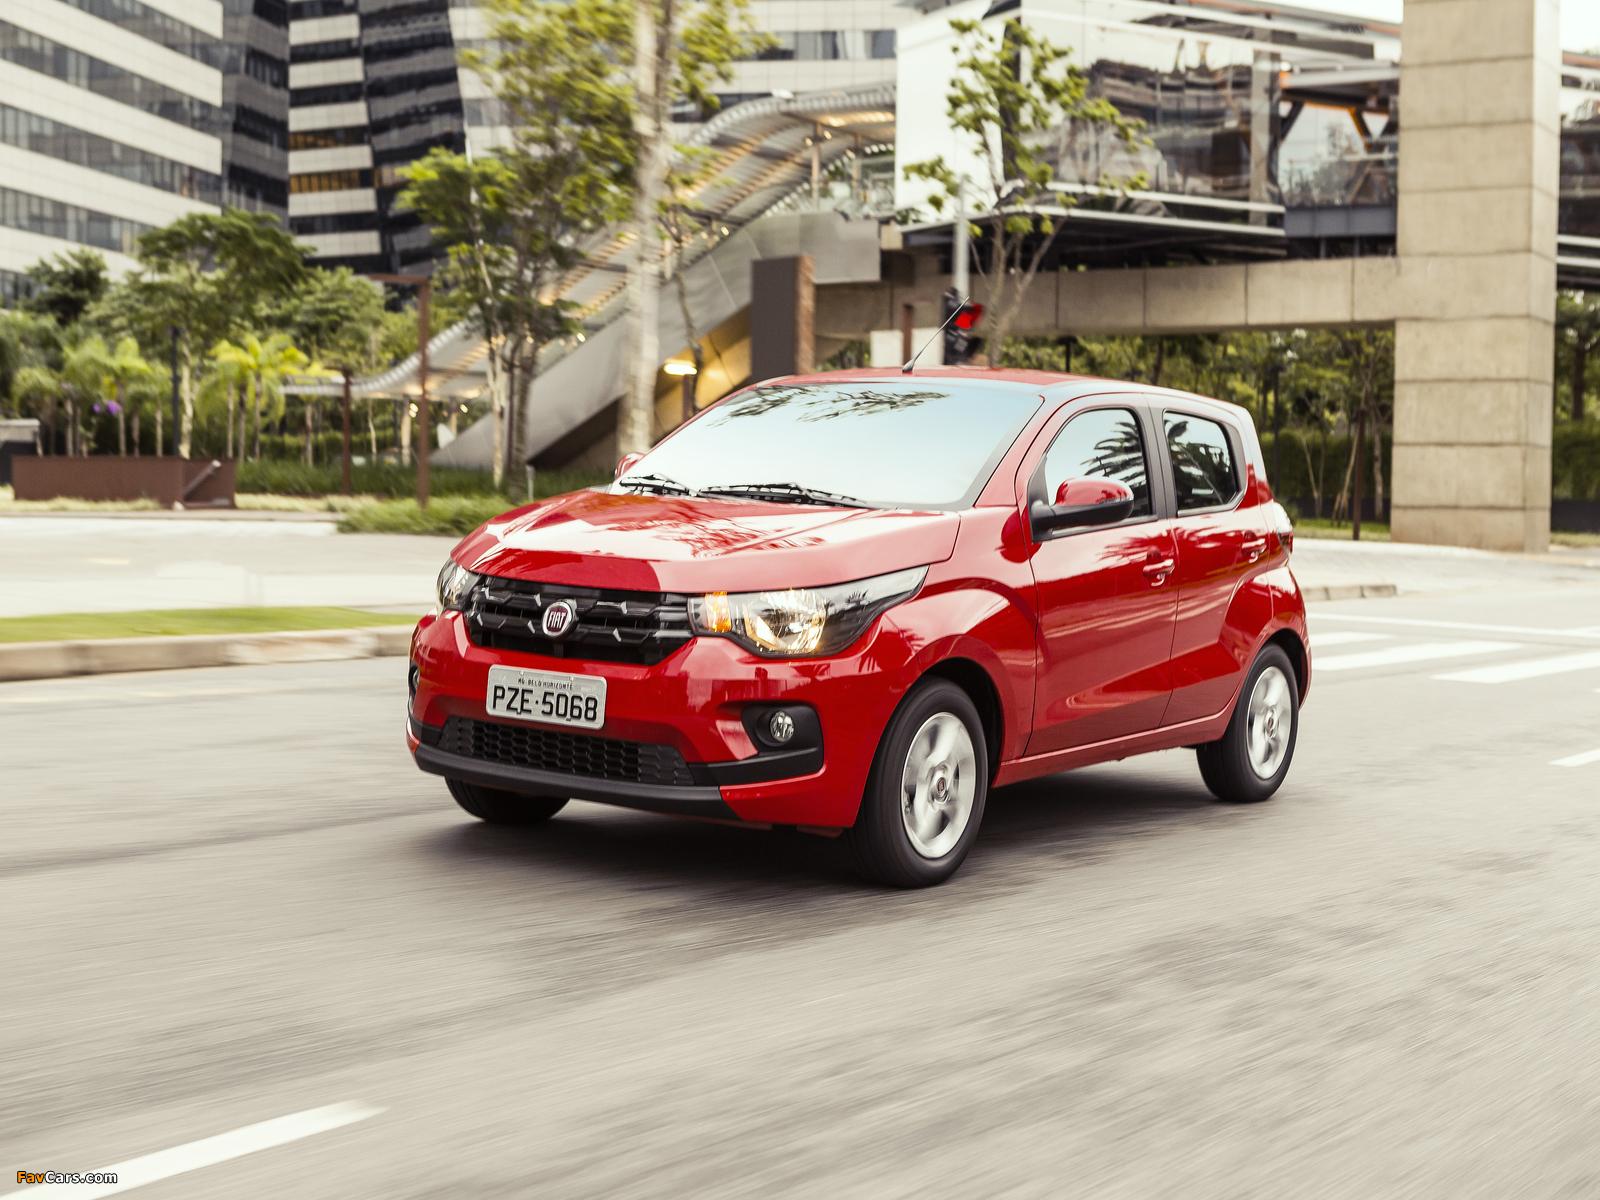 Fiat Mobi Drive GSR (344) 2017 pictures (1600 x 1200)